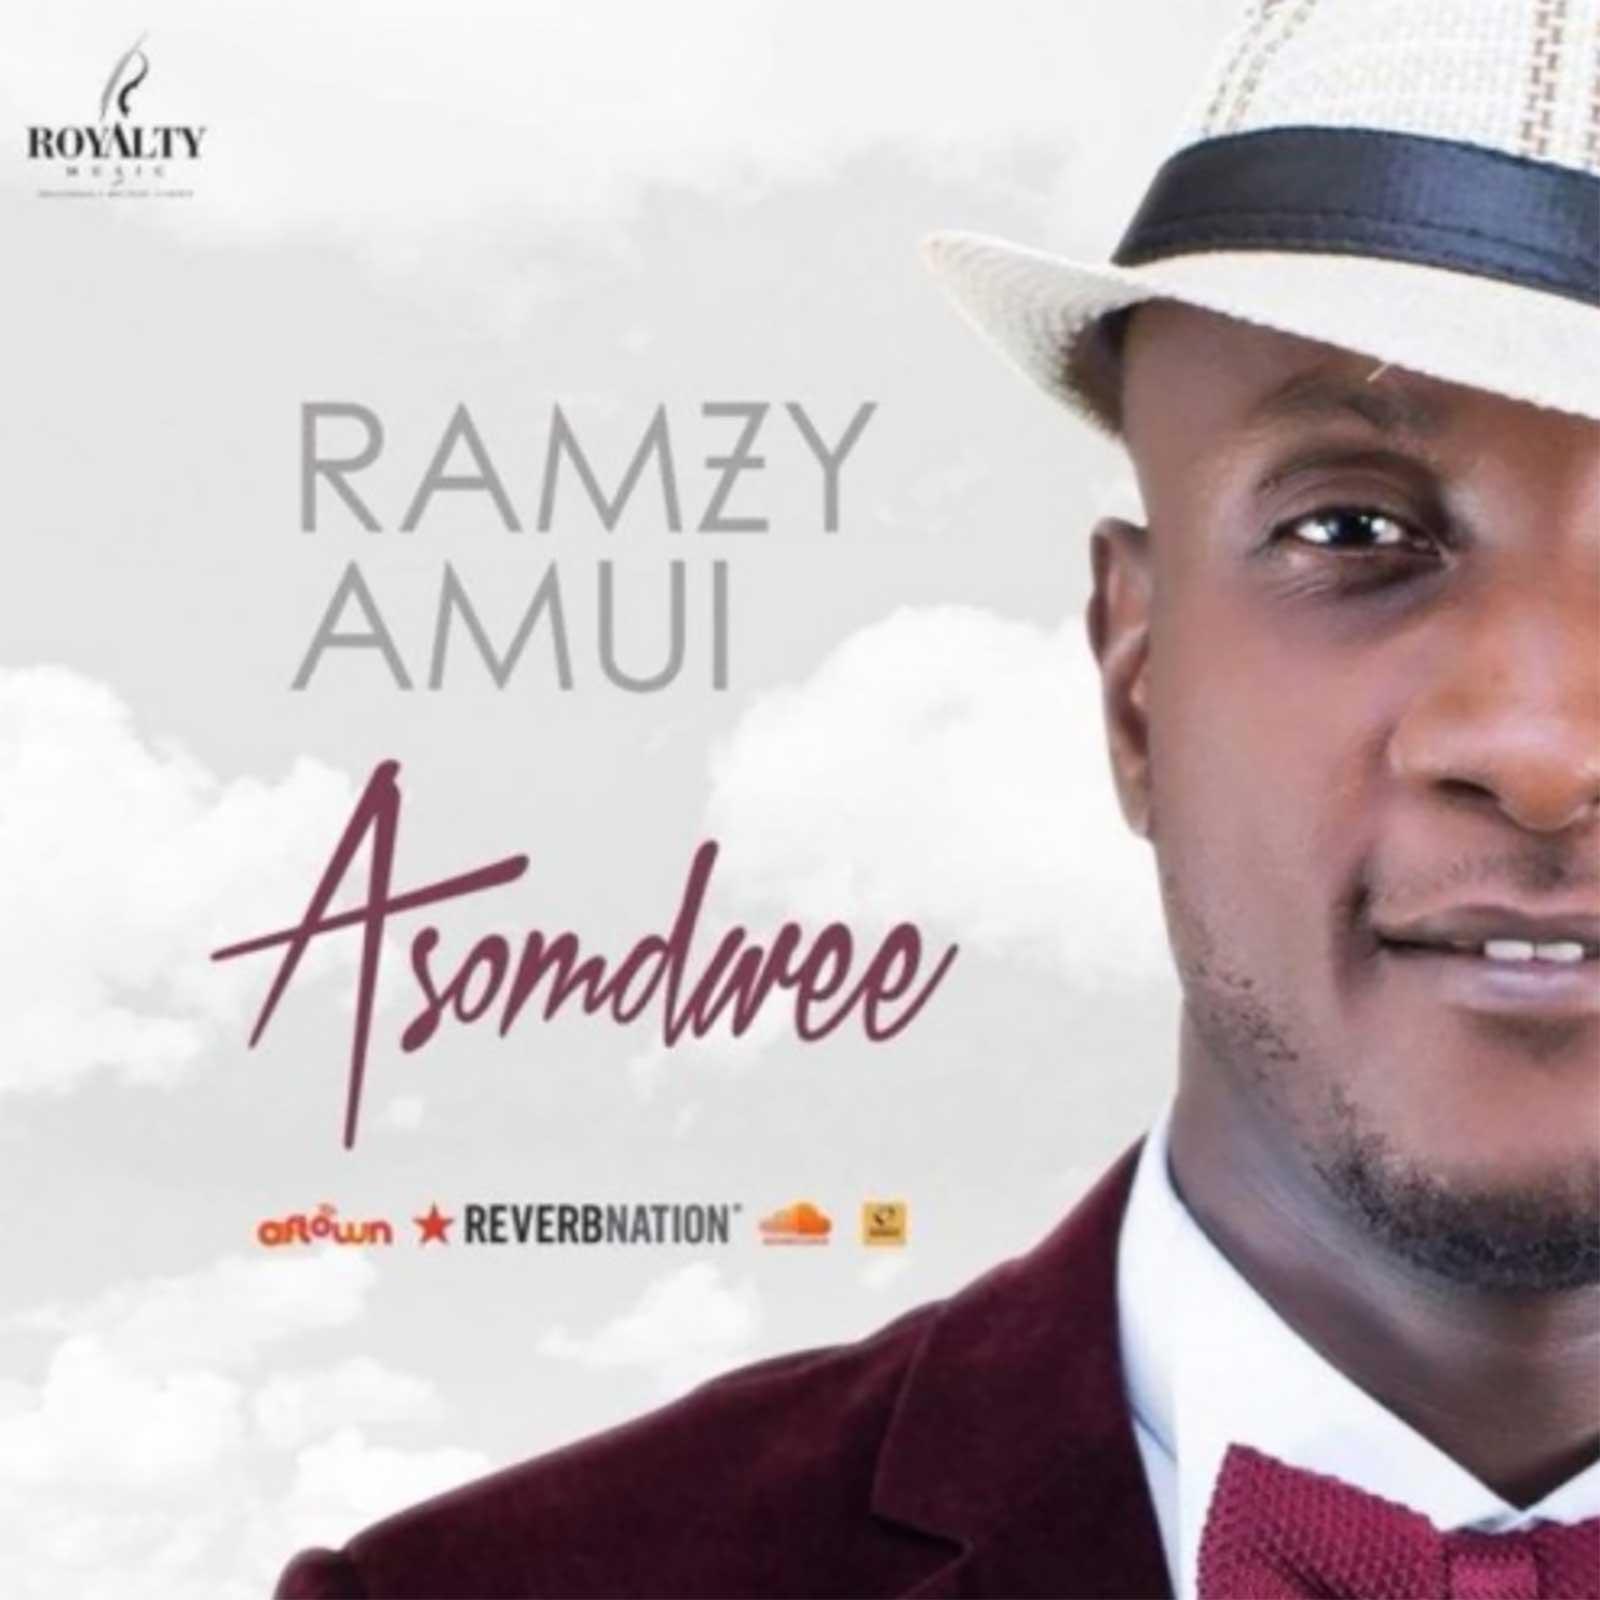 Asomdwee by Ramzy Amui